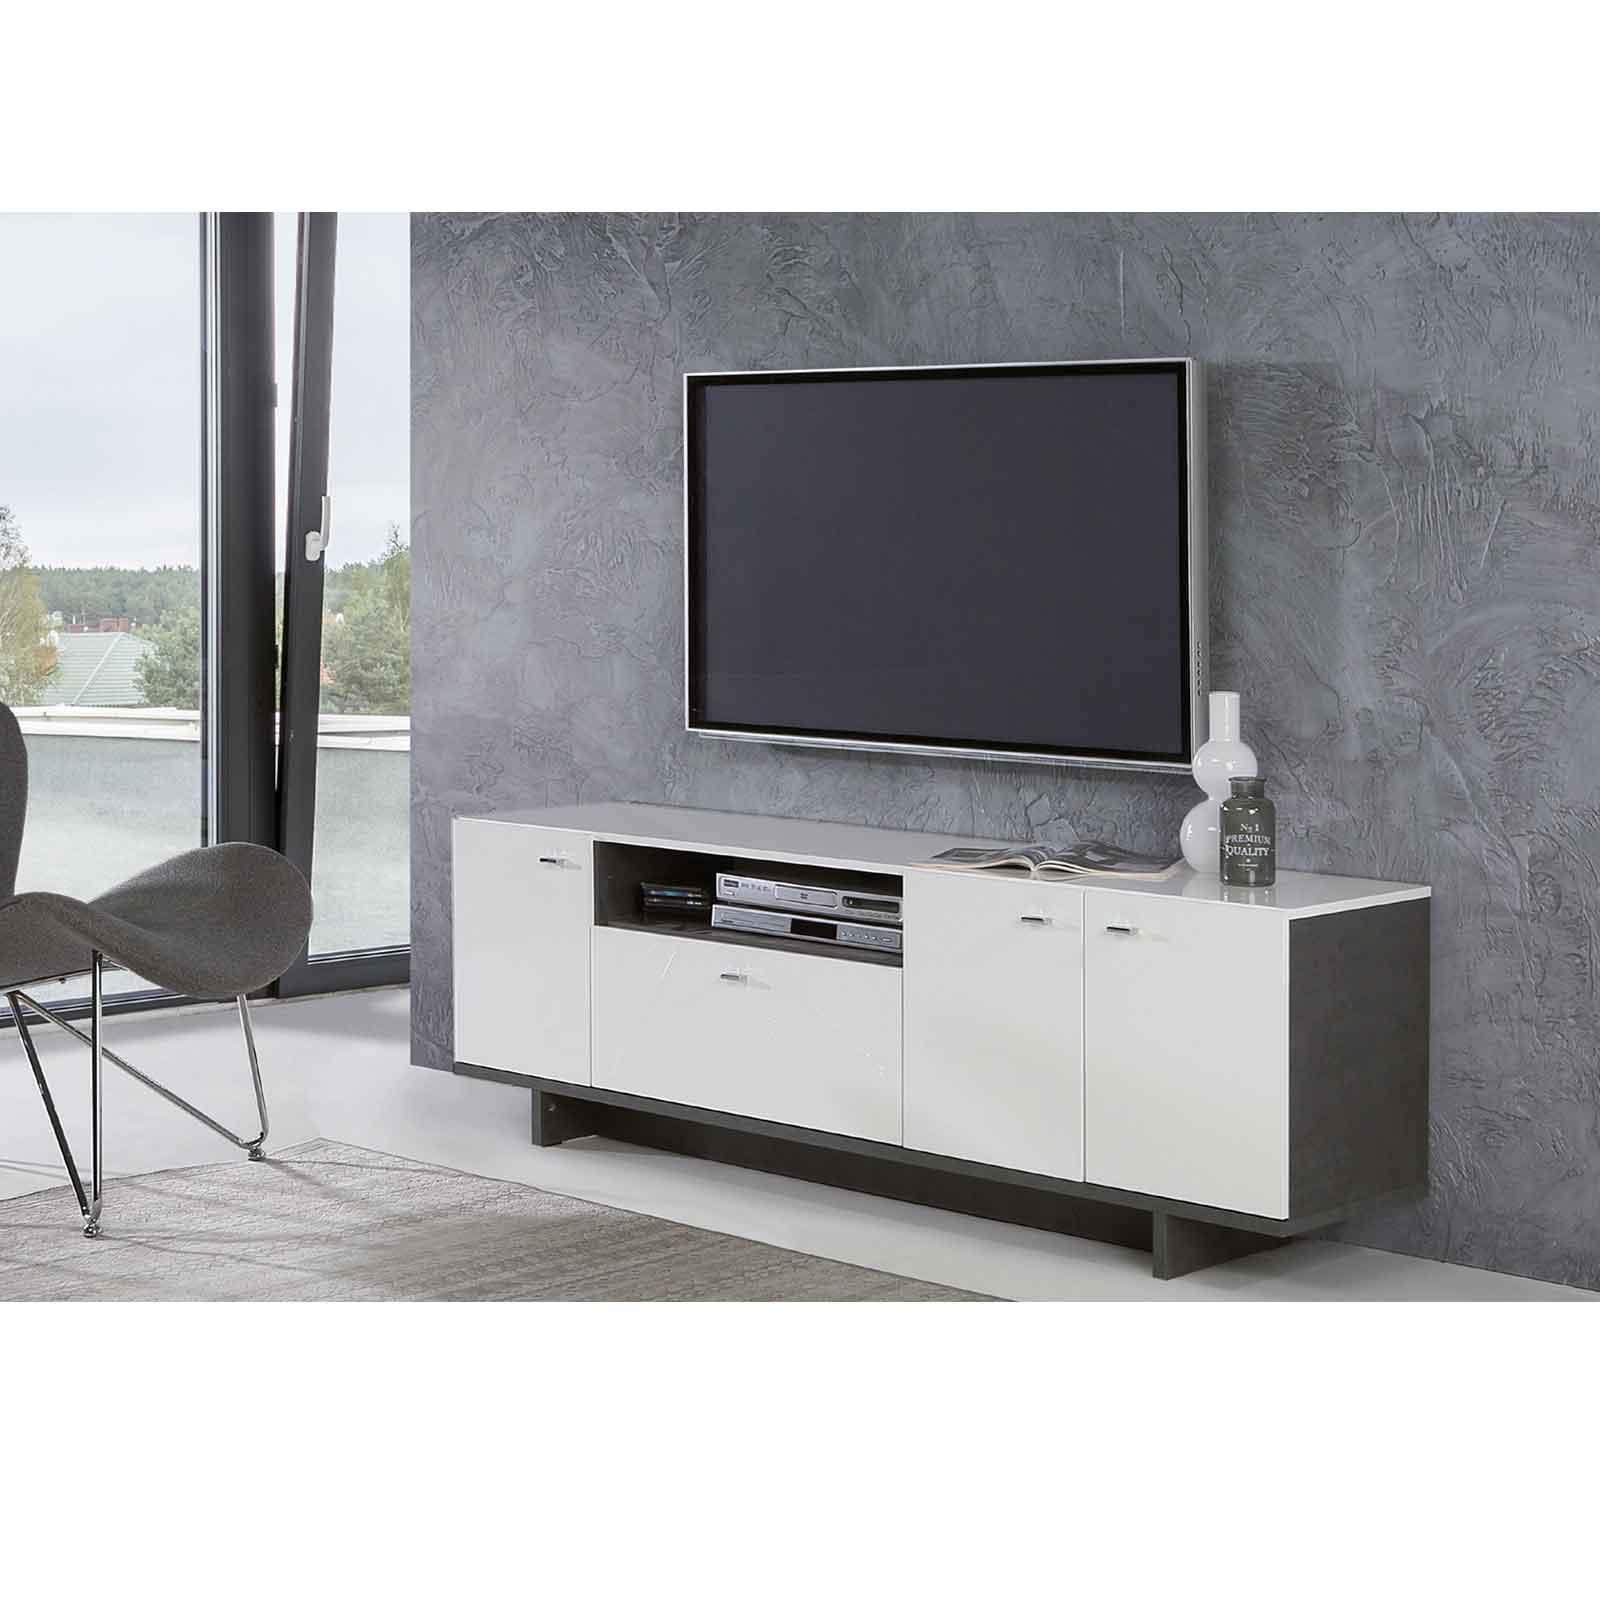 Tv Lowboard Weiss Hochglanz Beton Optik Online Bei Roller Kaufen